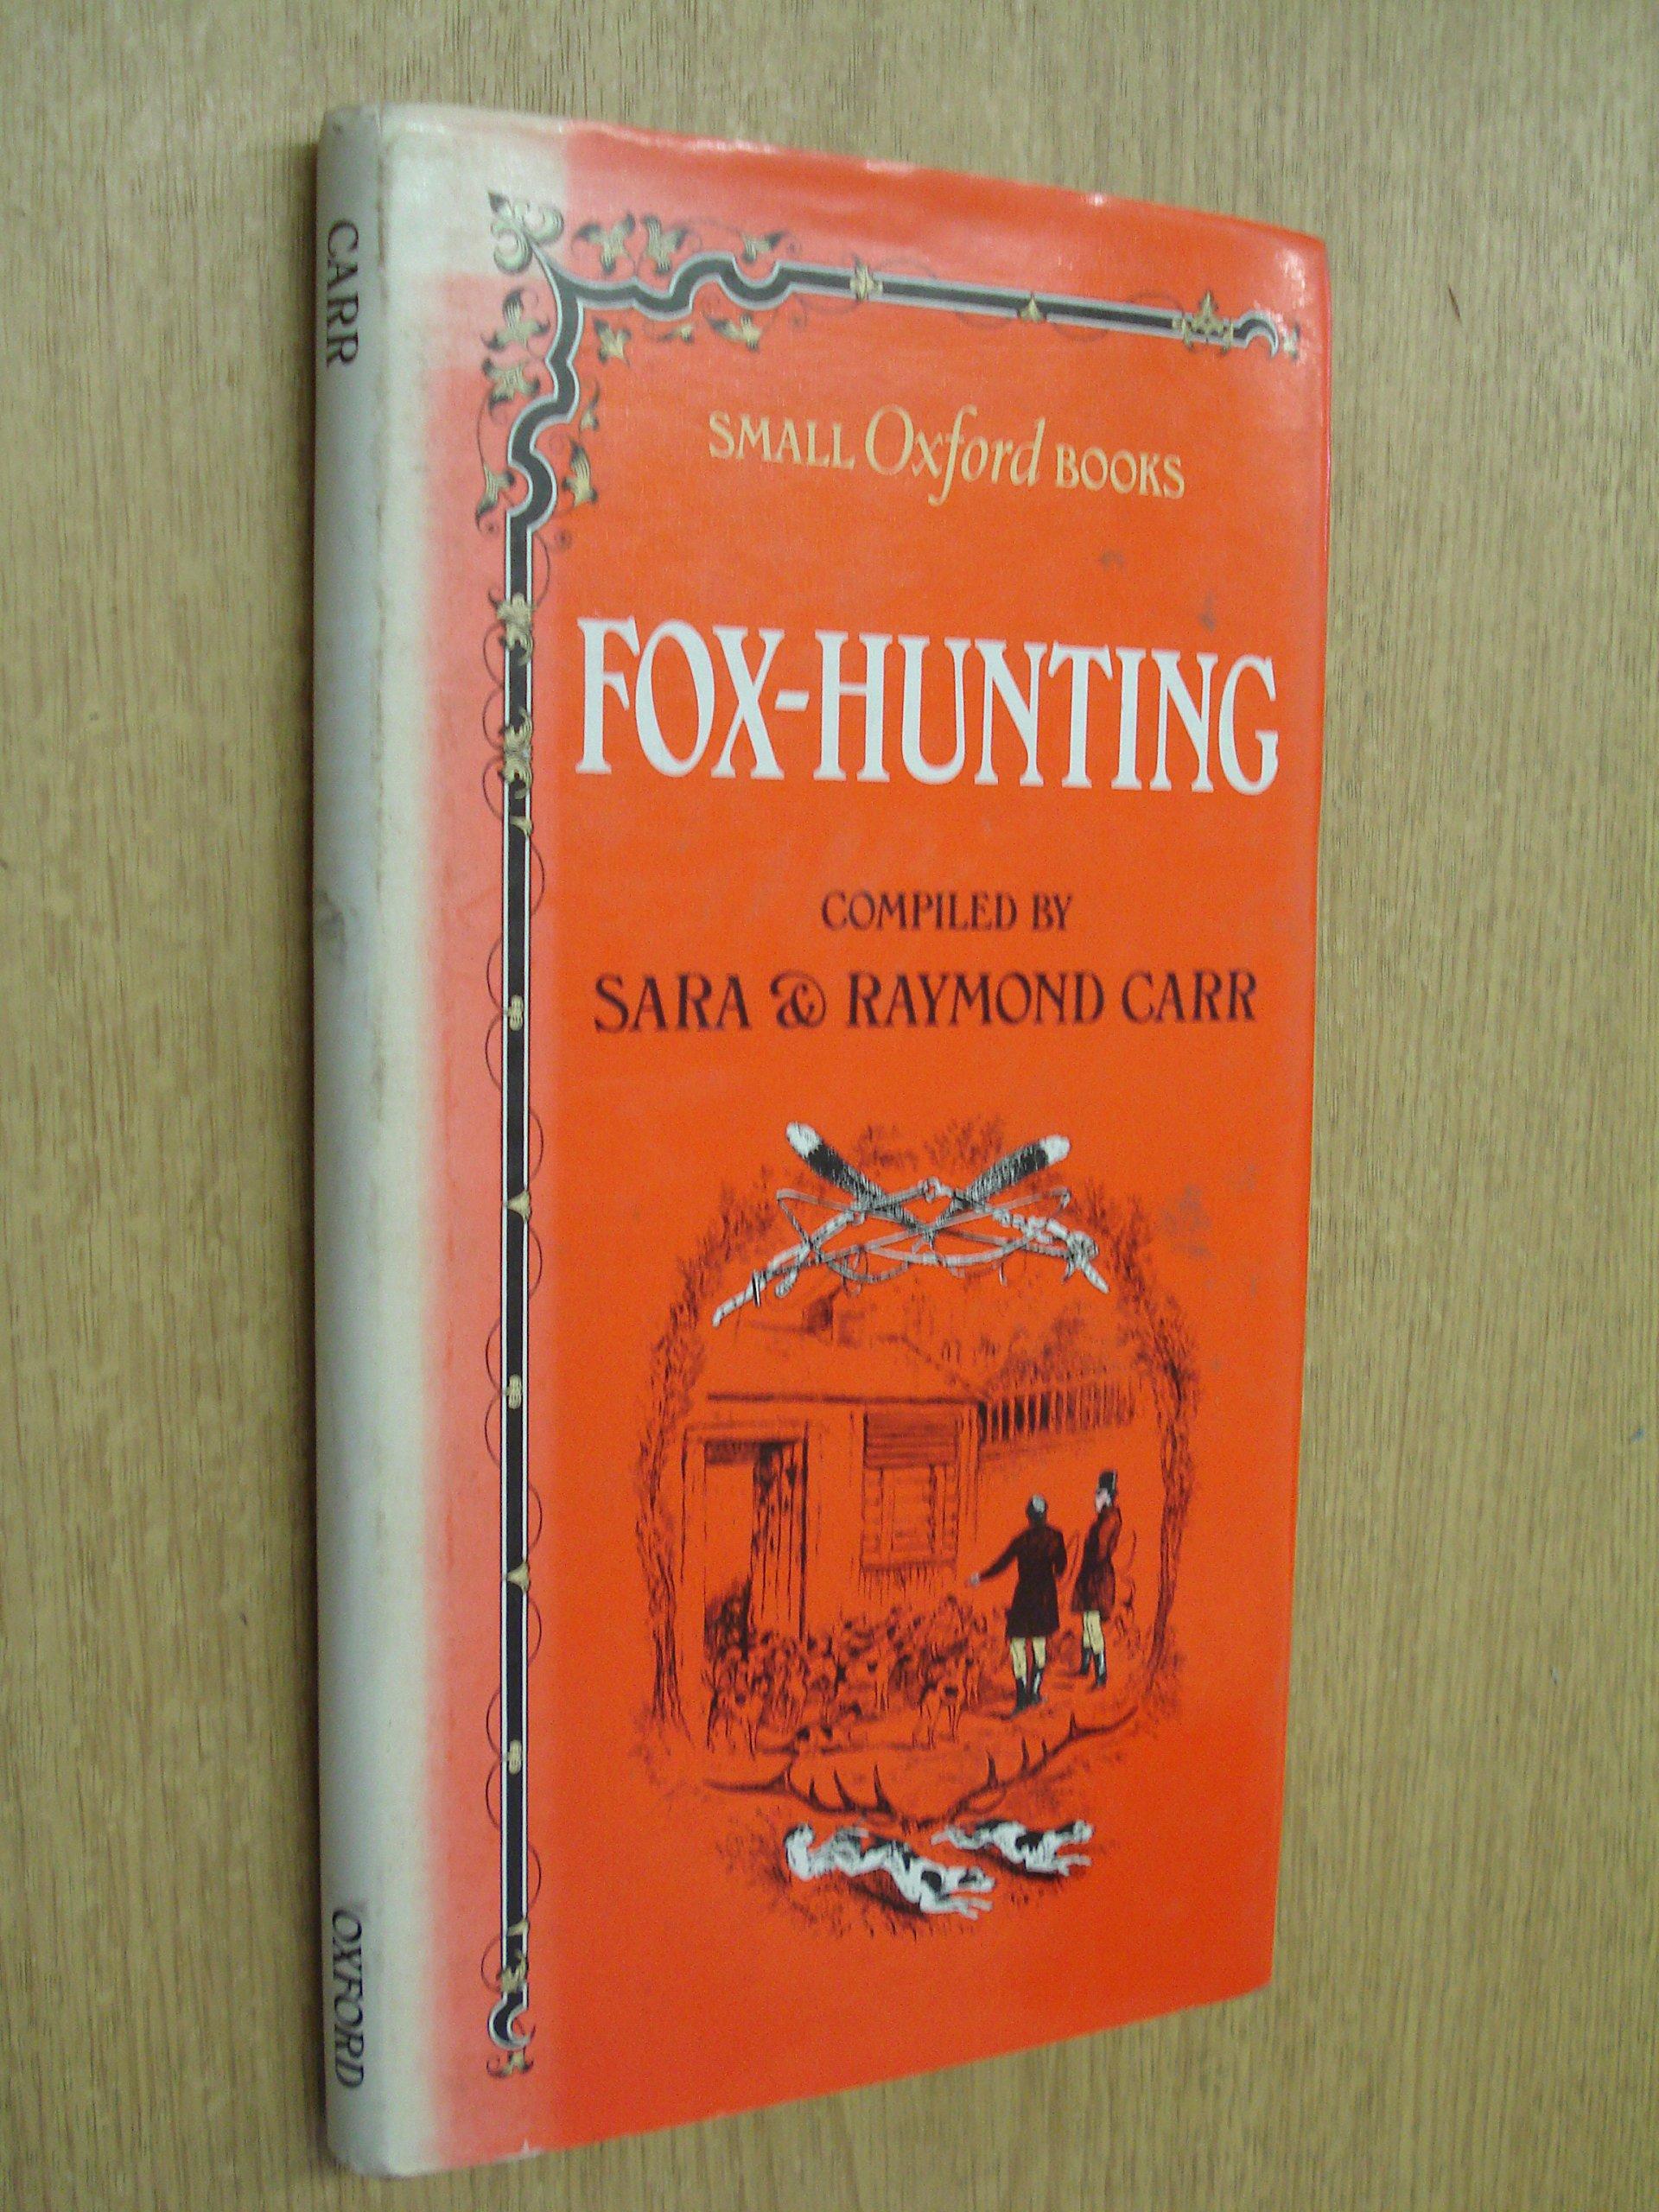 Foxhunting (Small Oxford books): Amazon.es: Carr, Sara, Carr, Raymond: Libros en idiomas extranjeros